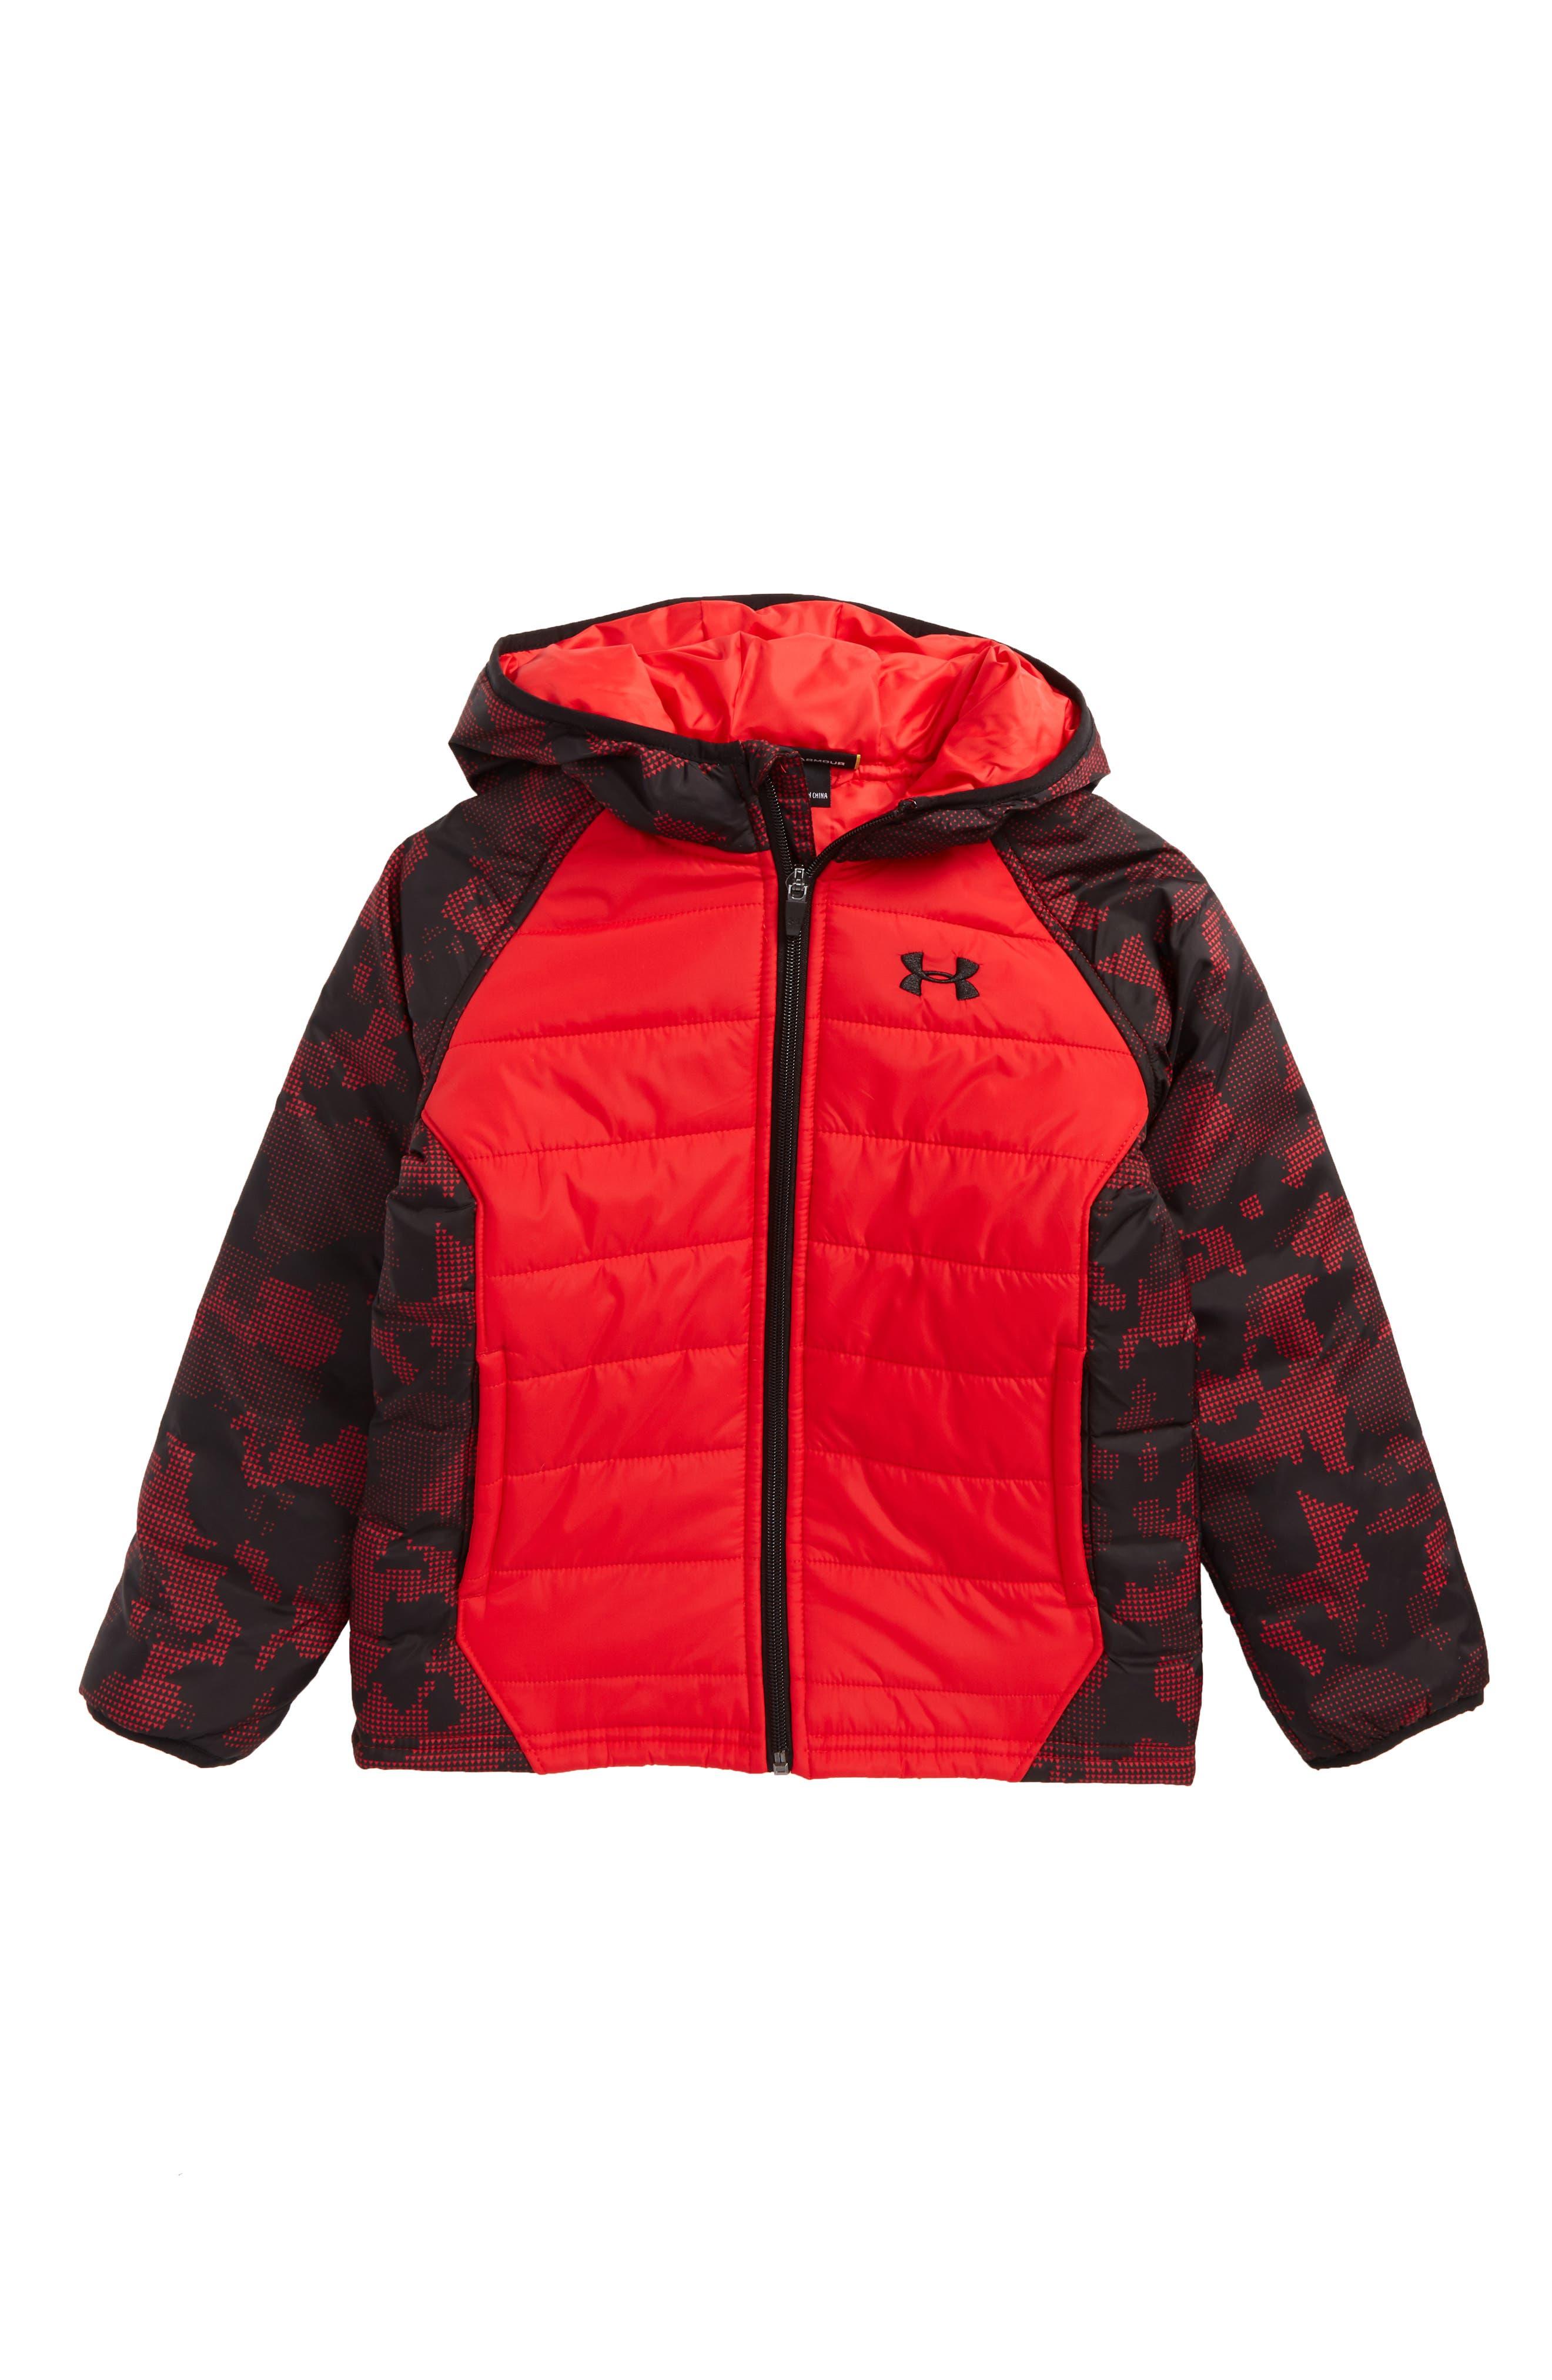 Boys' Under Armour Red Coats, Jackets & Outerwear: Fleece & Parka ...